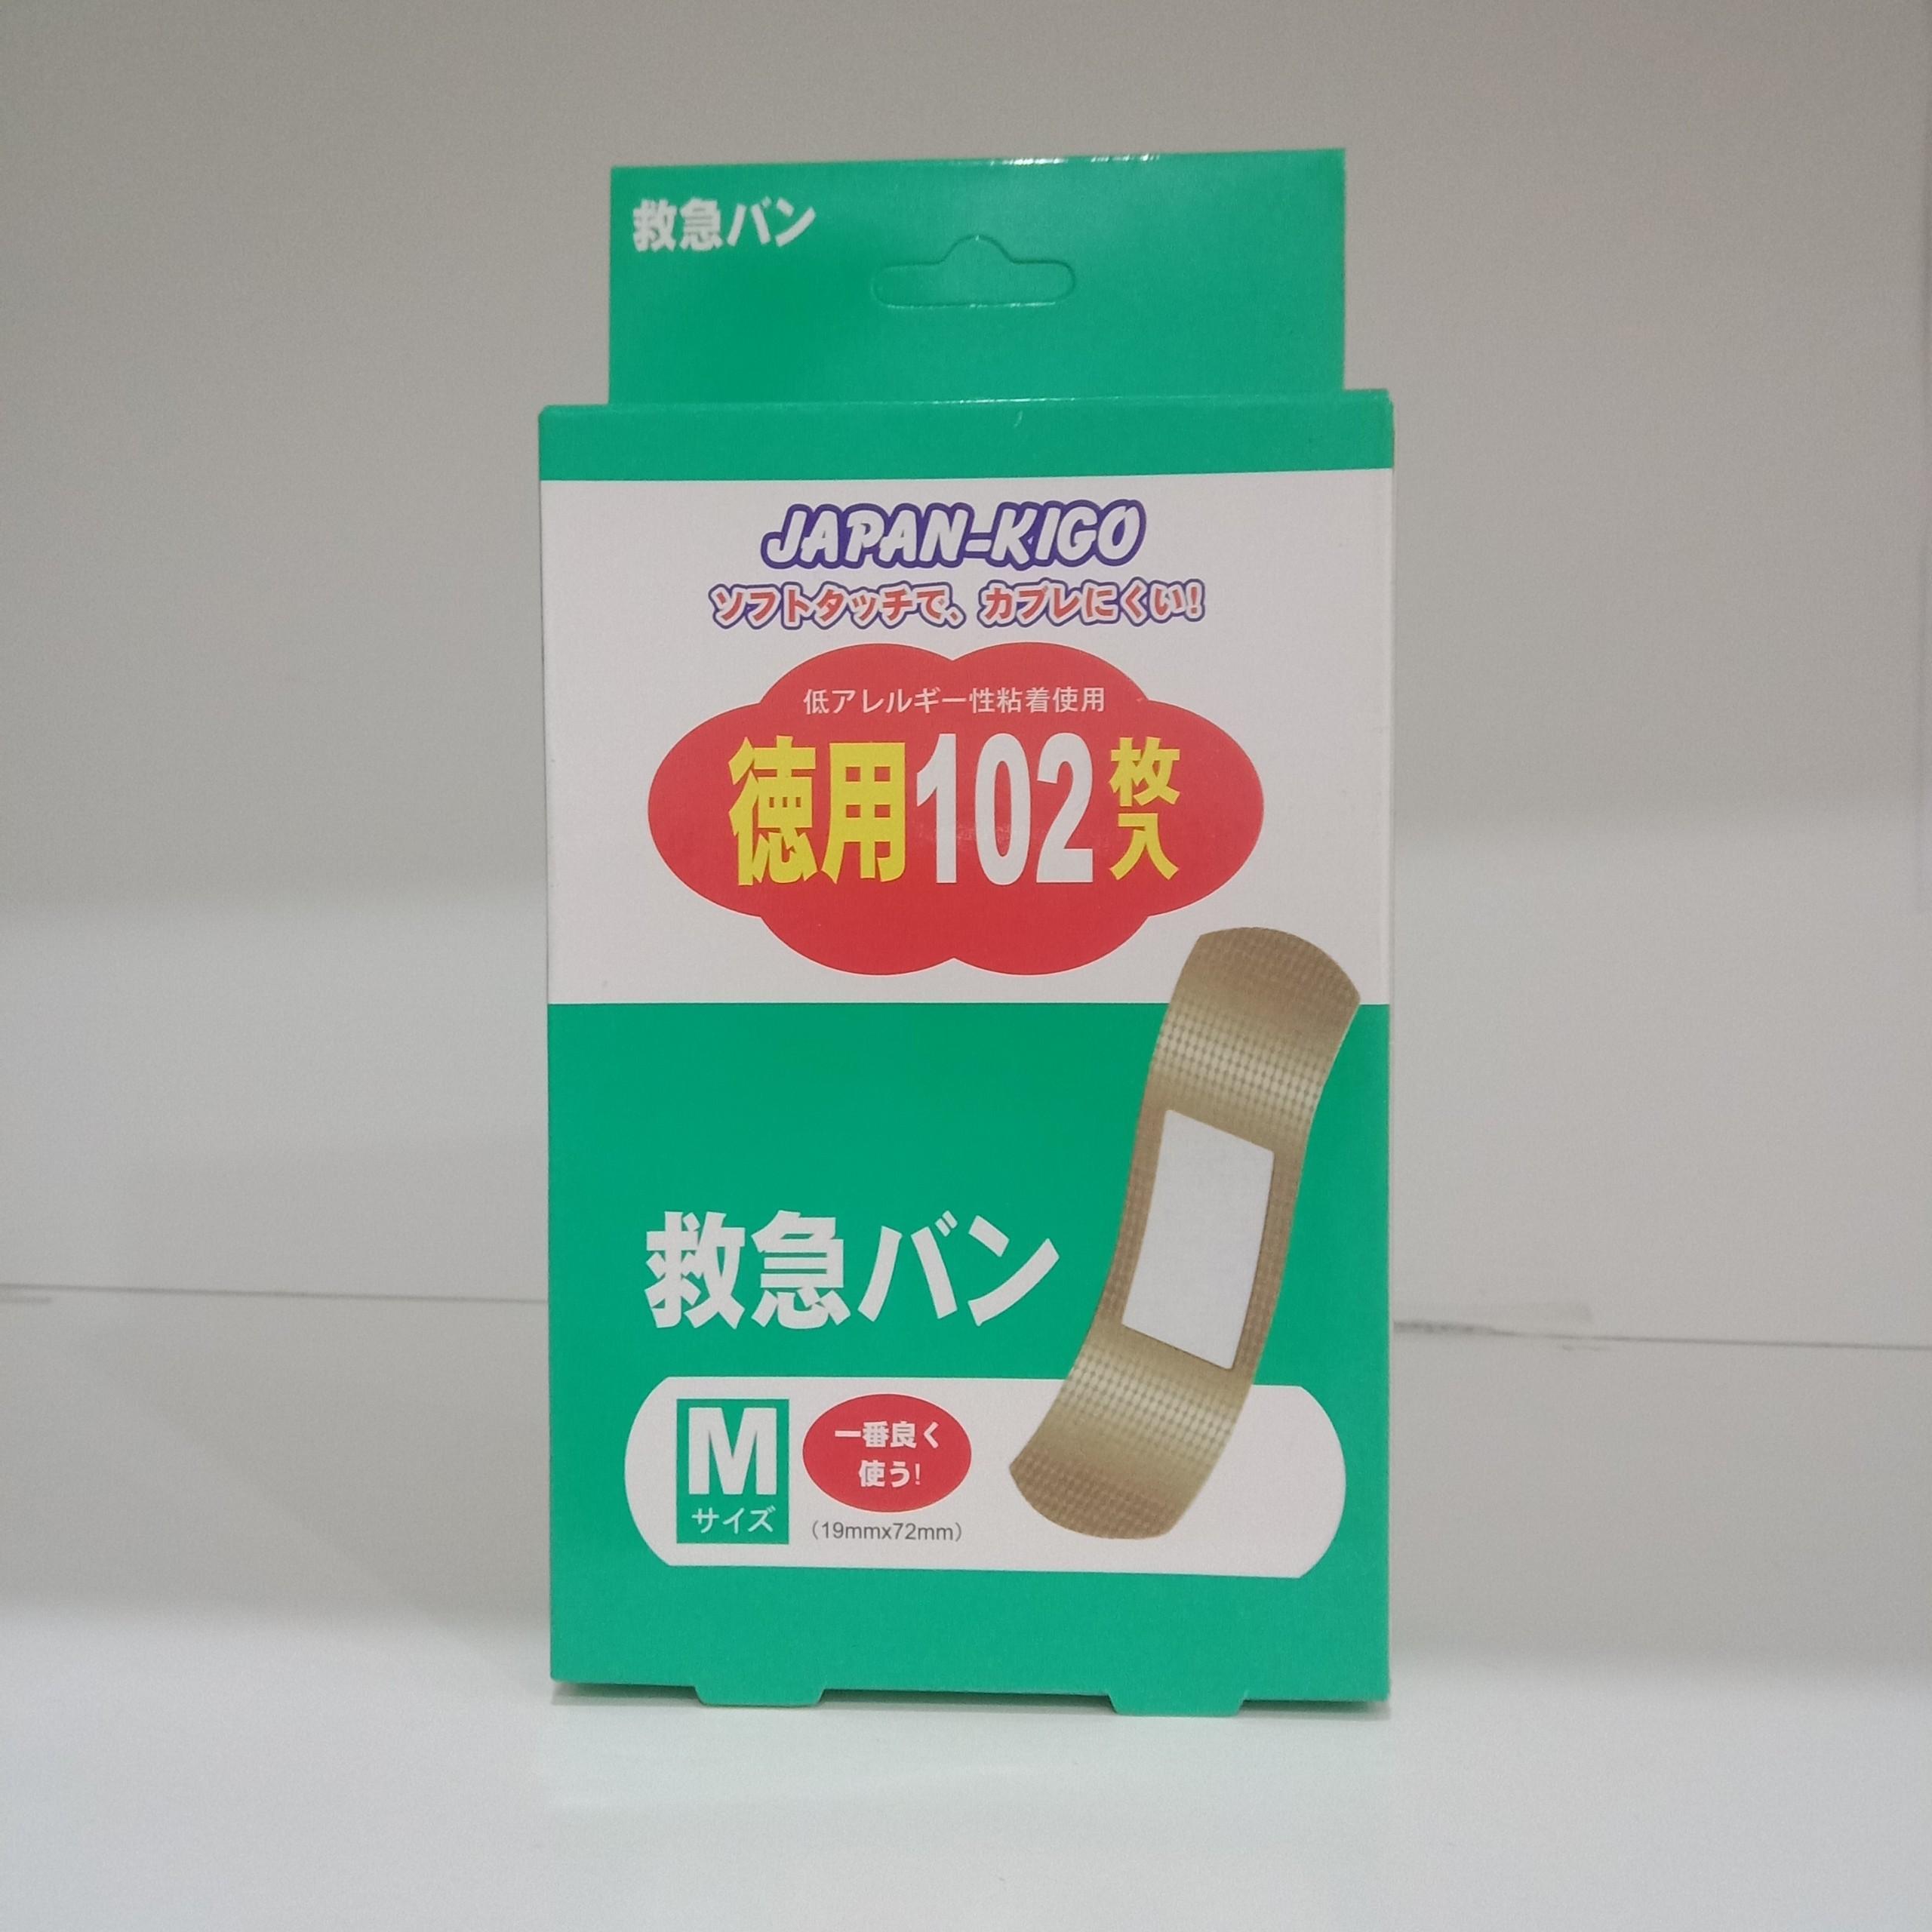 Miếng dán urgo Japan Kigo hộp 102 miếng nhật bản cao cấp